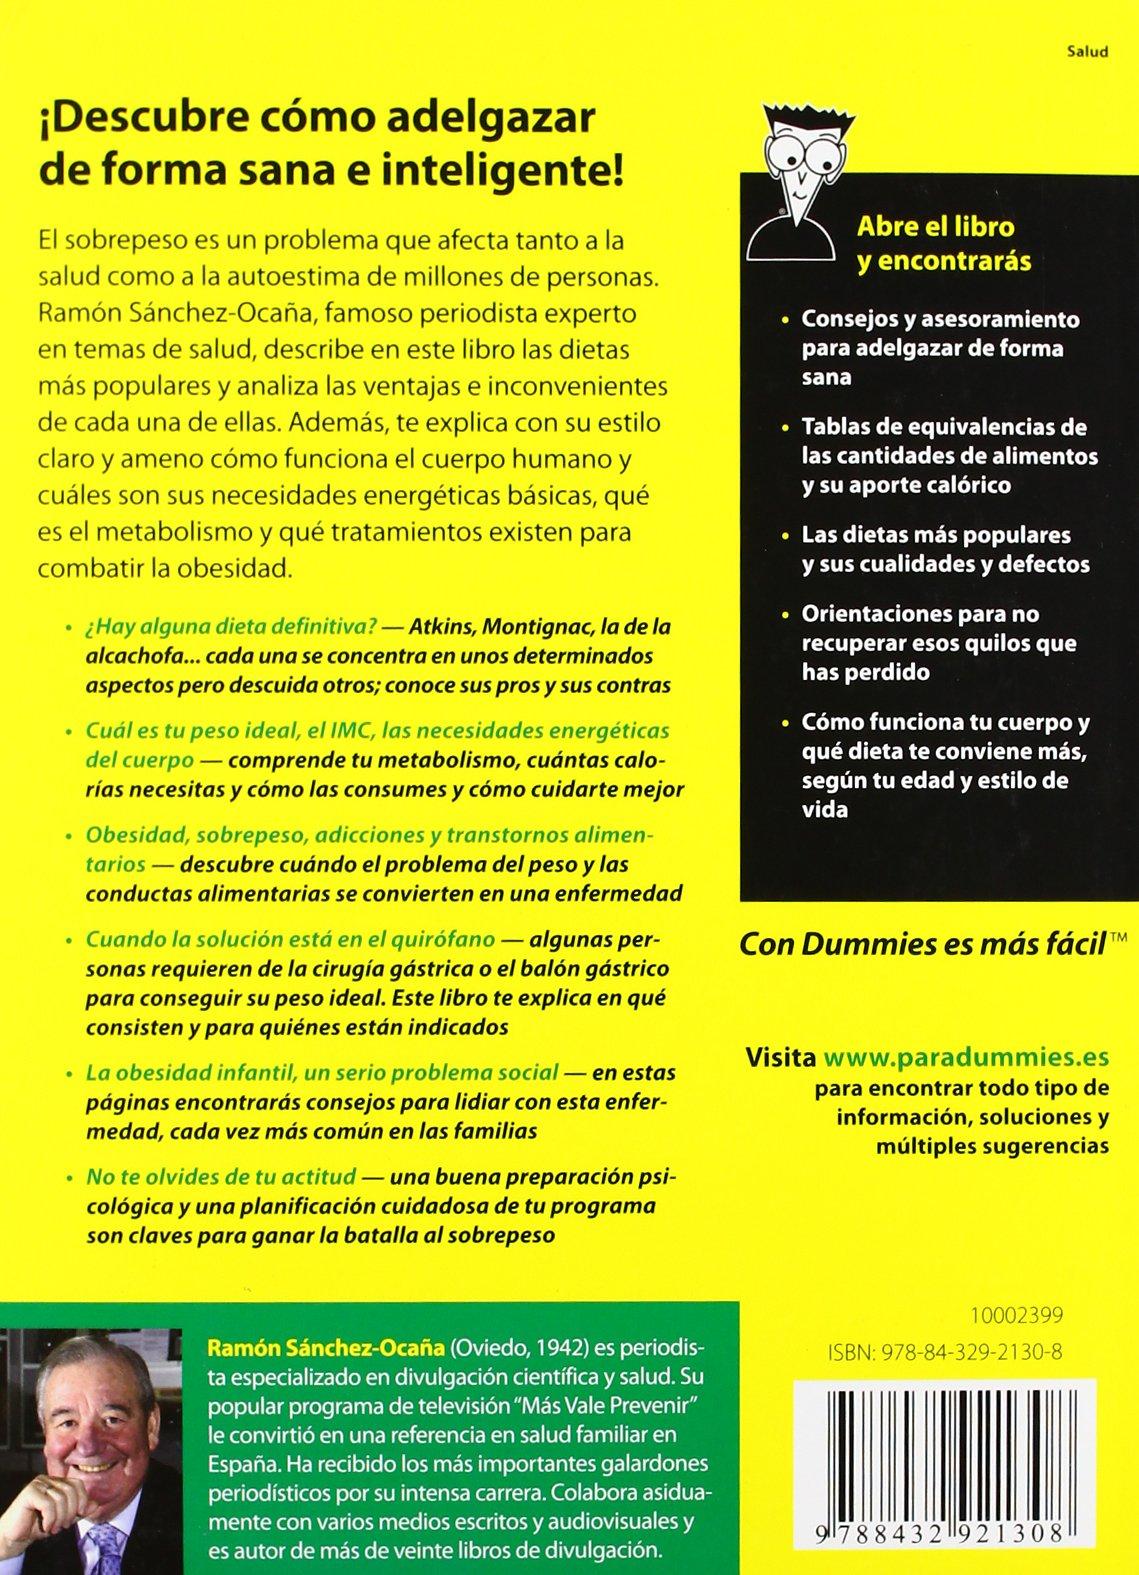 Perder peso para dummies: Amazon.es: Ramón Sánchez-Ocaña: Libros